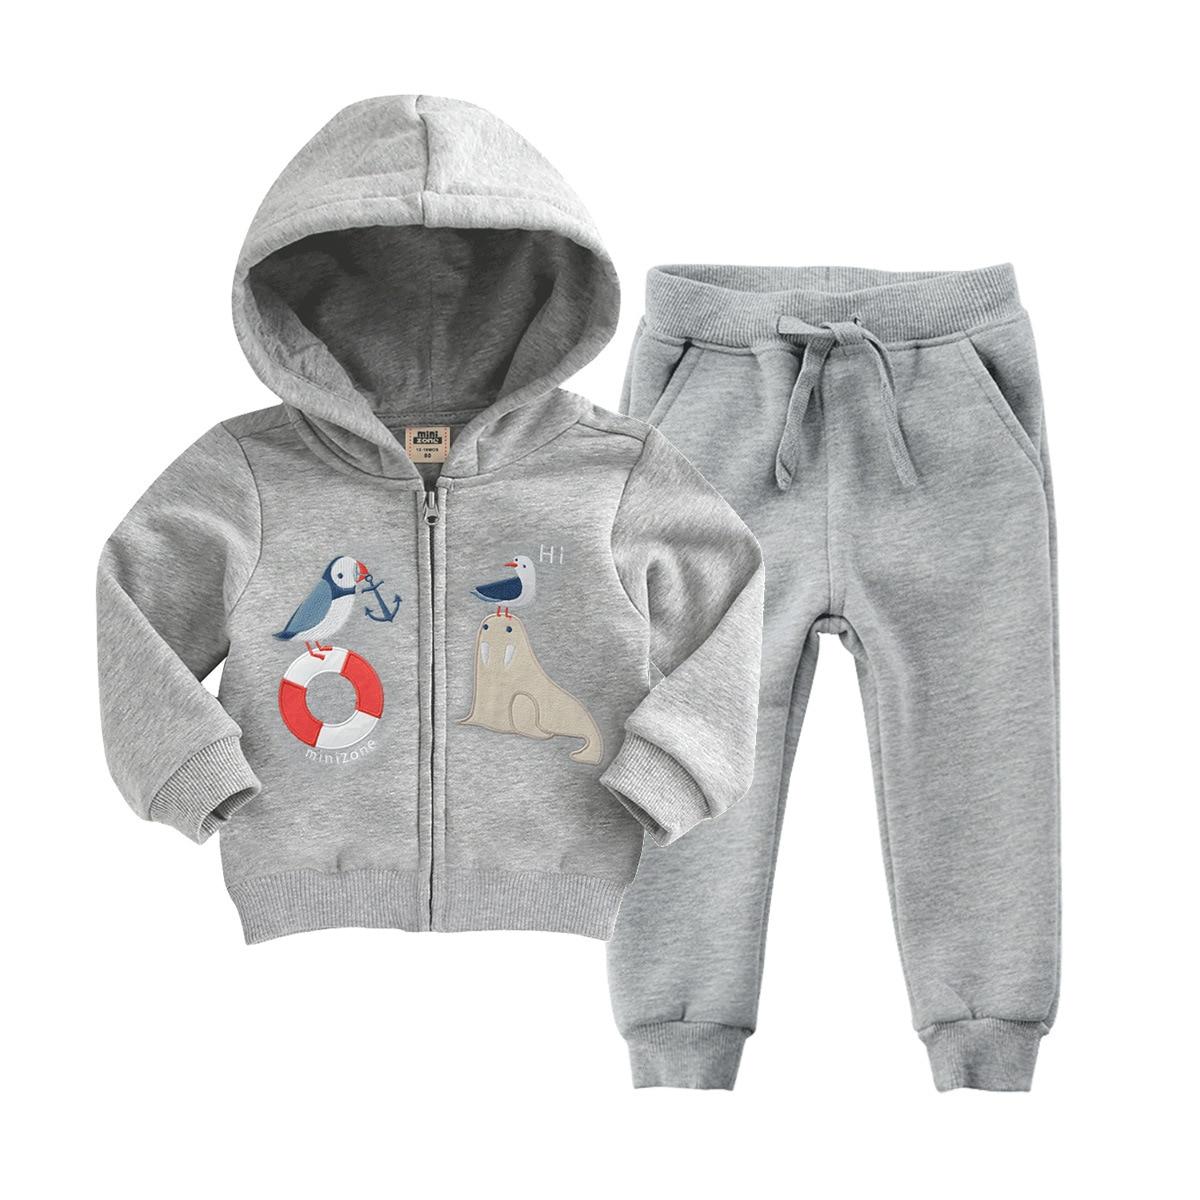 все цены на Orangemon Offical Store Newborn Baby Boys Autumn Clothing 2 Pc/set Girls Velvet Outfit Long Sleeved Hoodie Jacket + Pants Suit